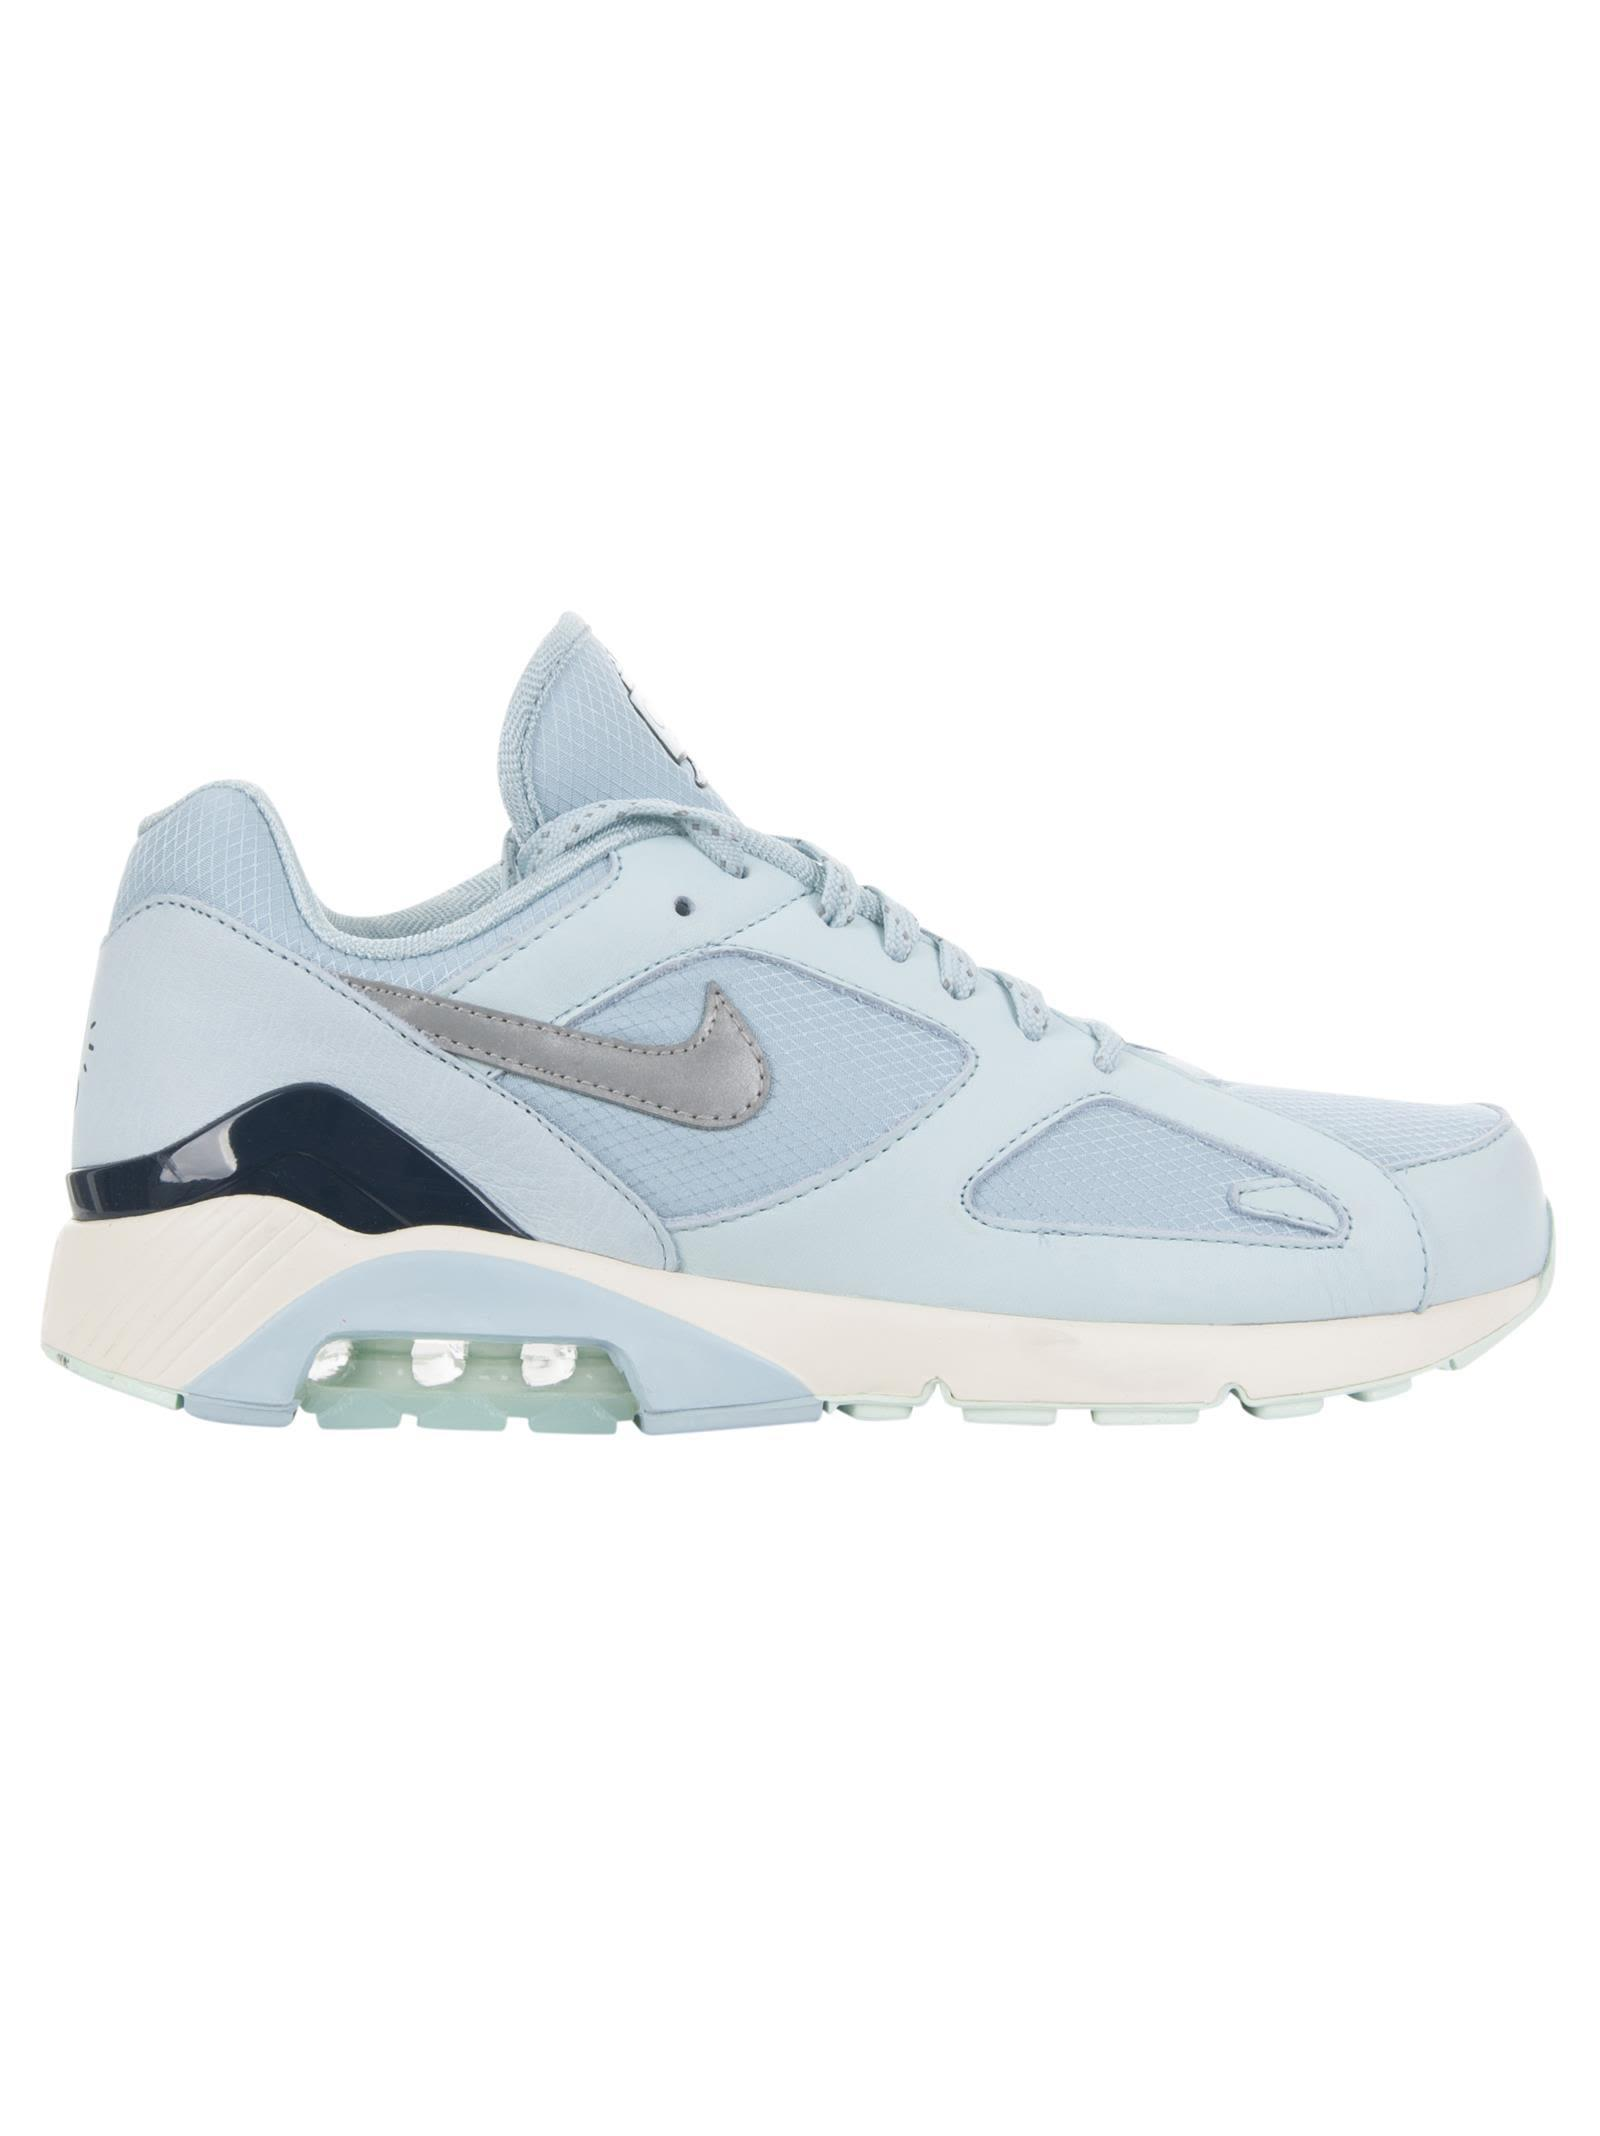 Nike Air Max 1 celeste